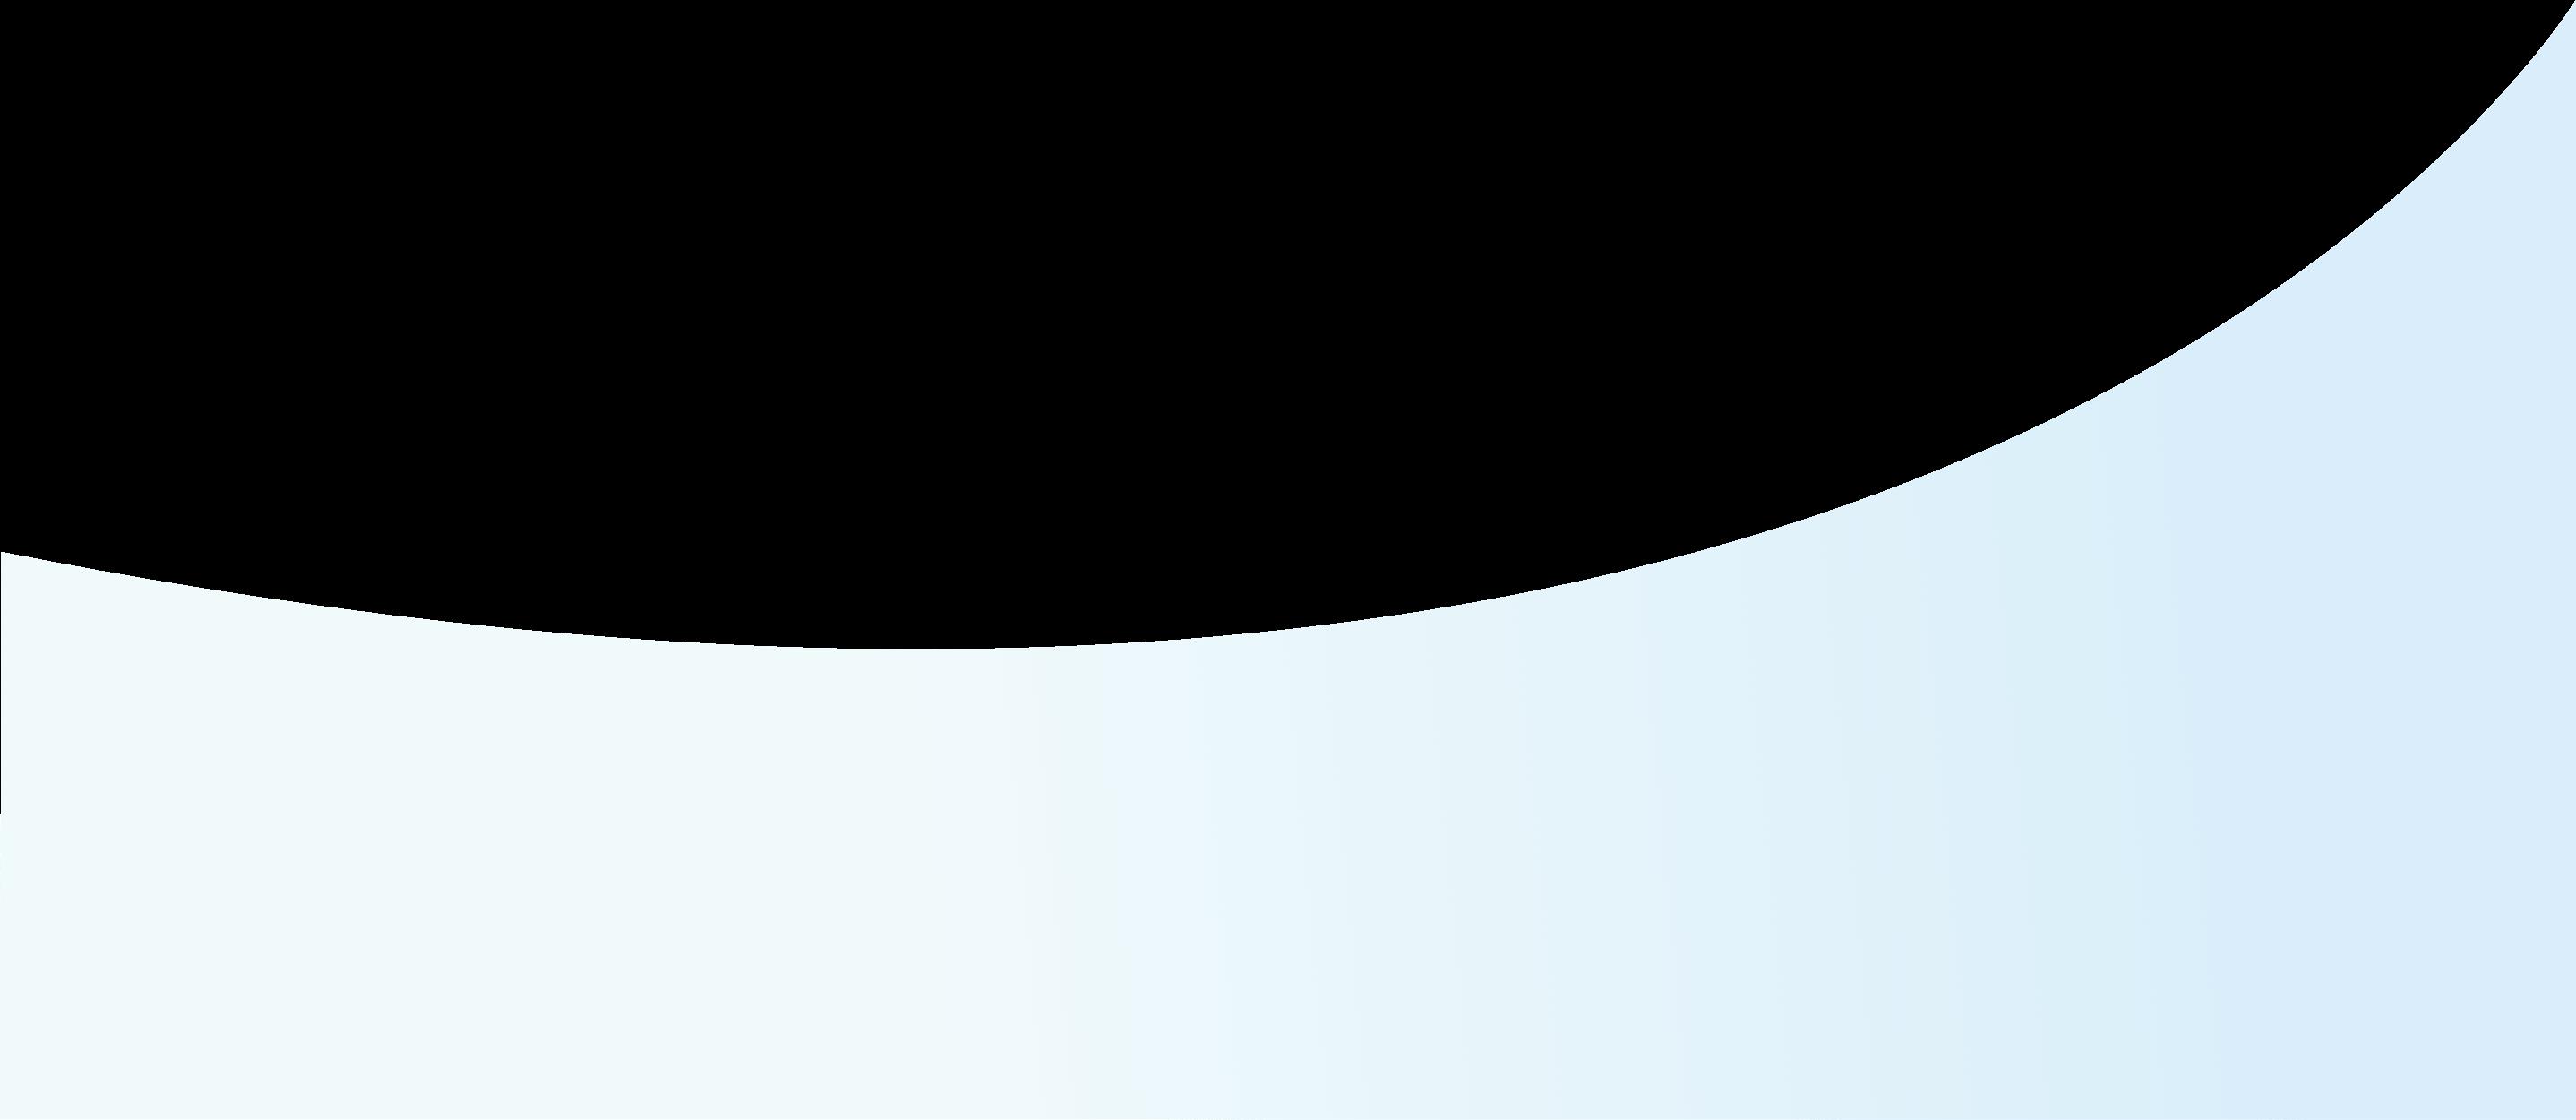 Swirl Bottom Image